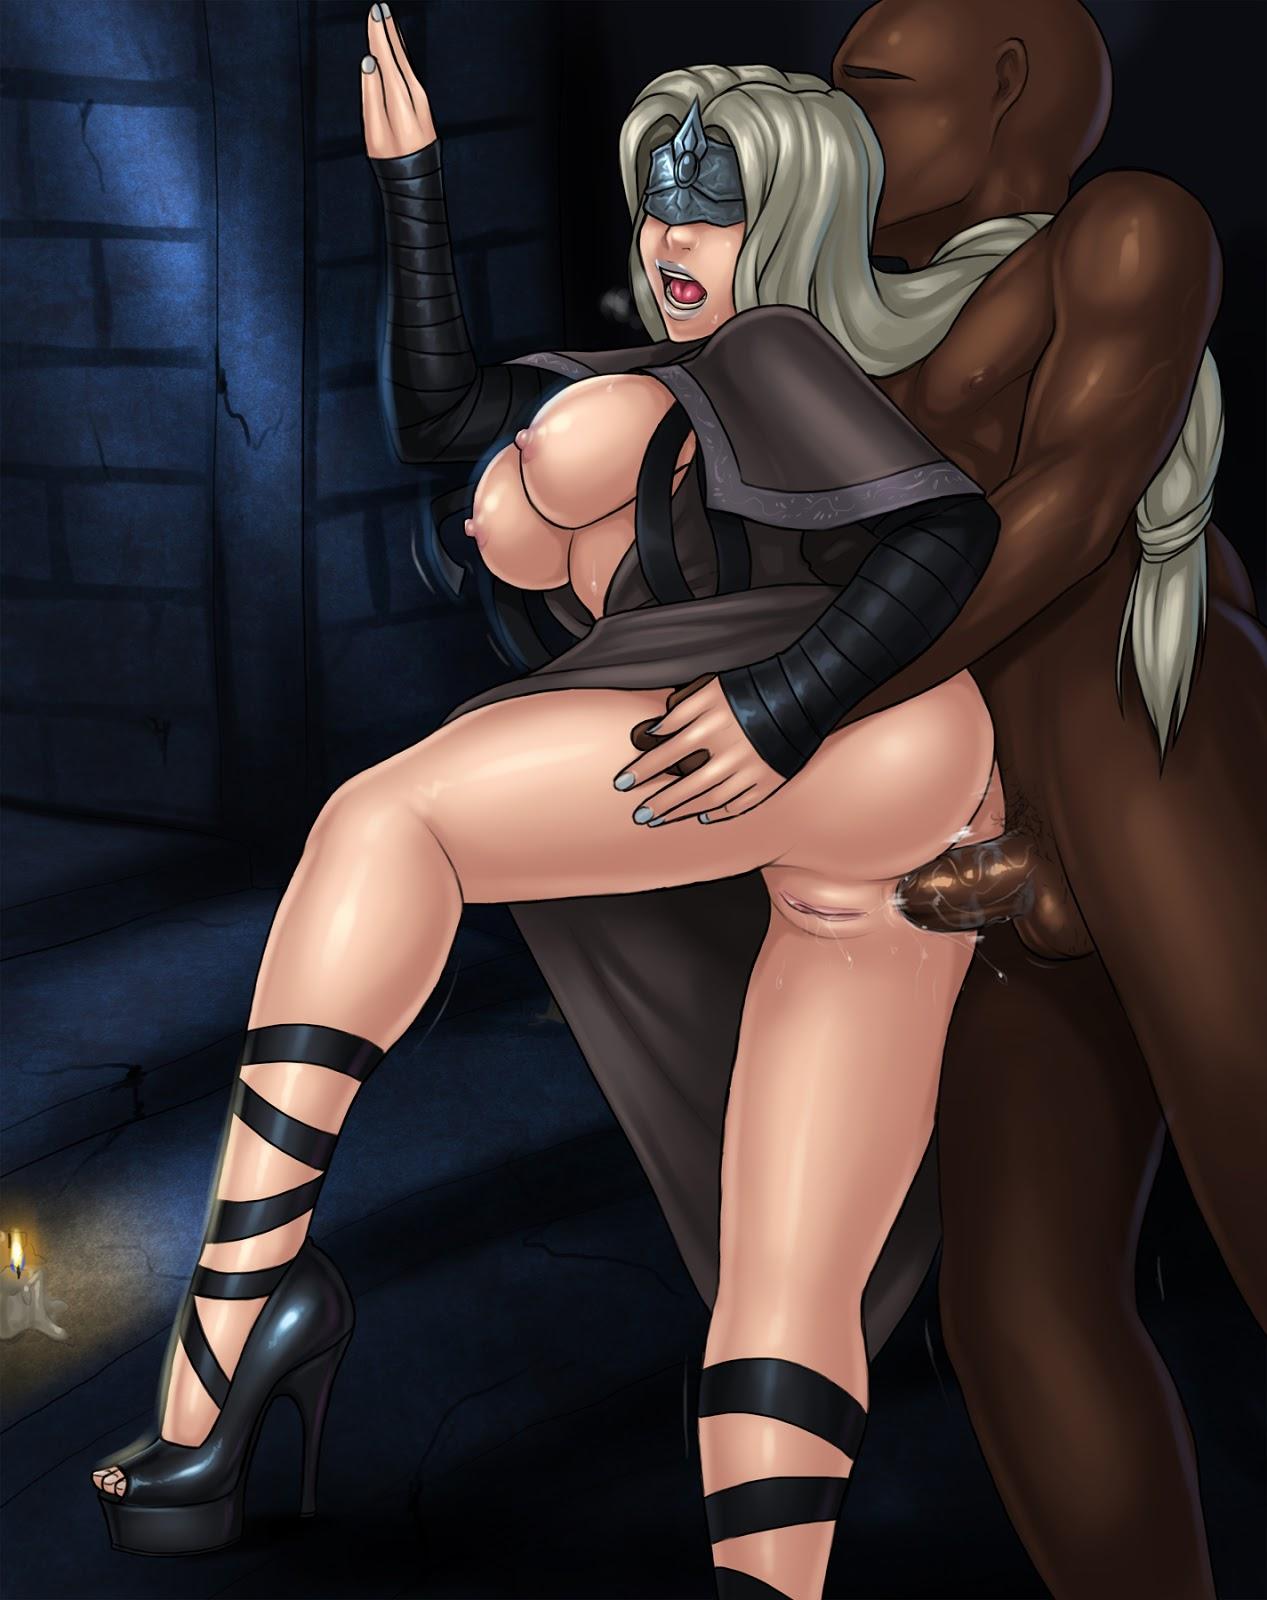 legs souls dark cat 2 Dungeon travelers 2 censored images comparison